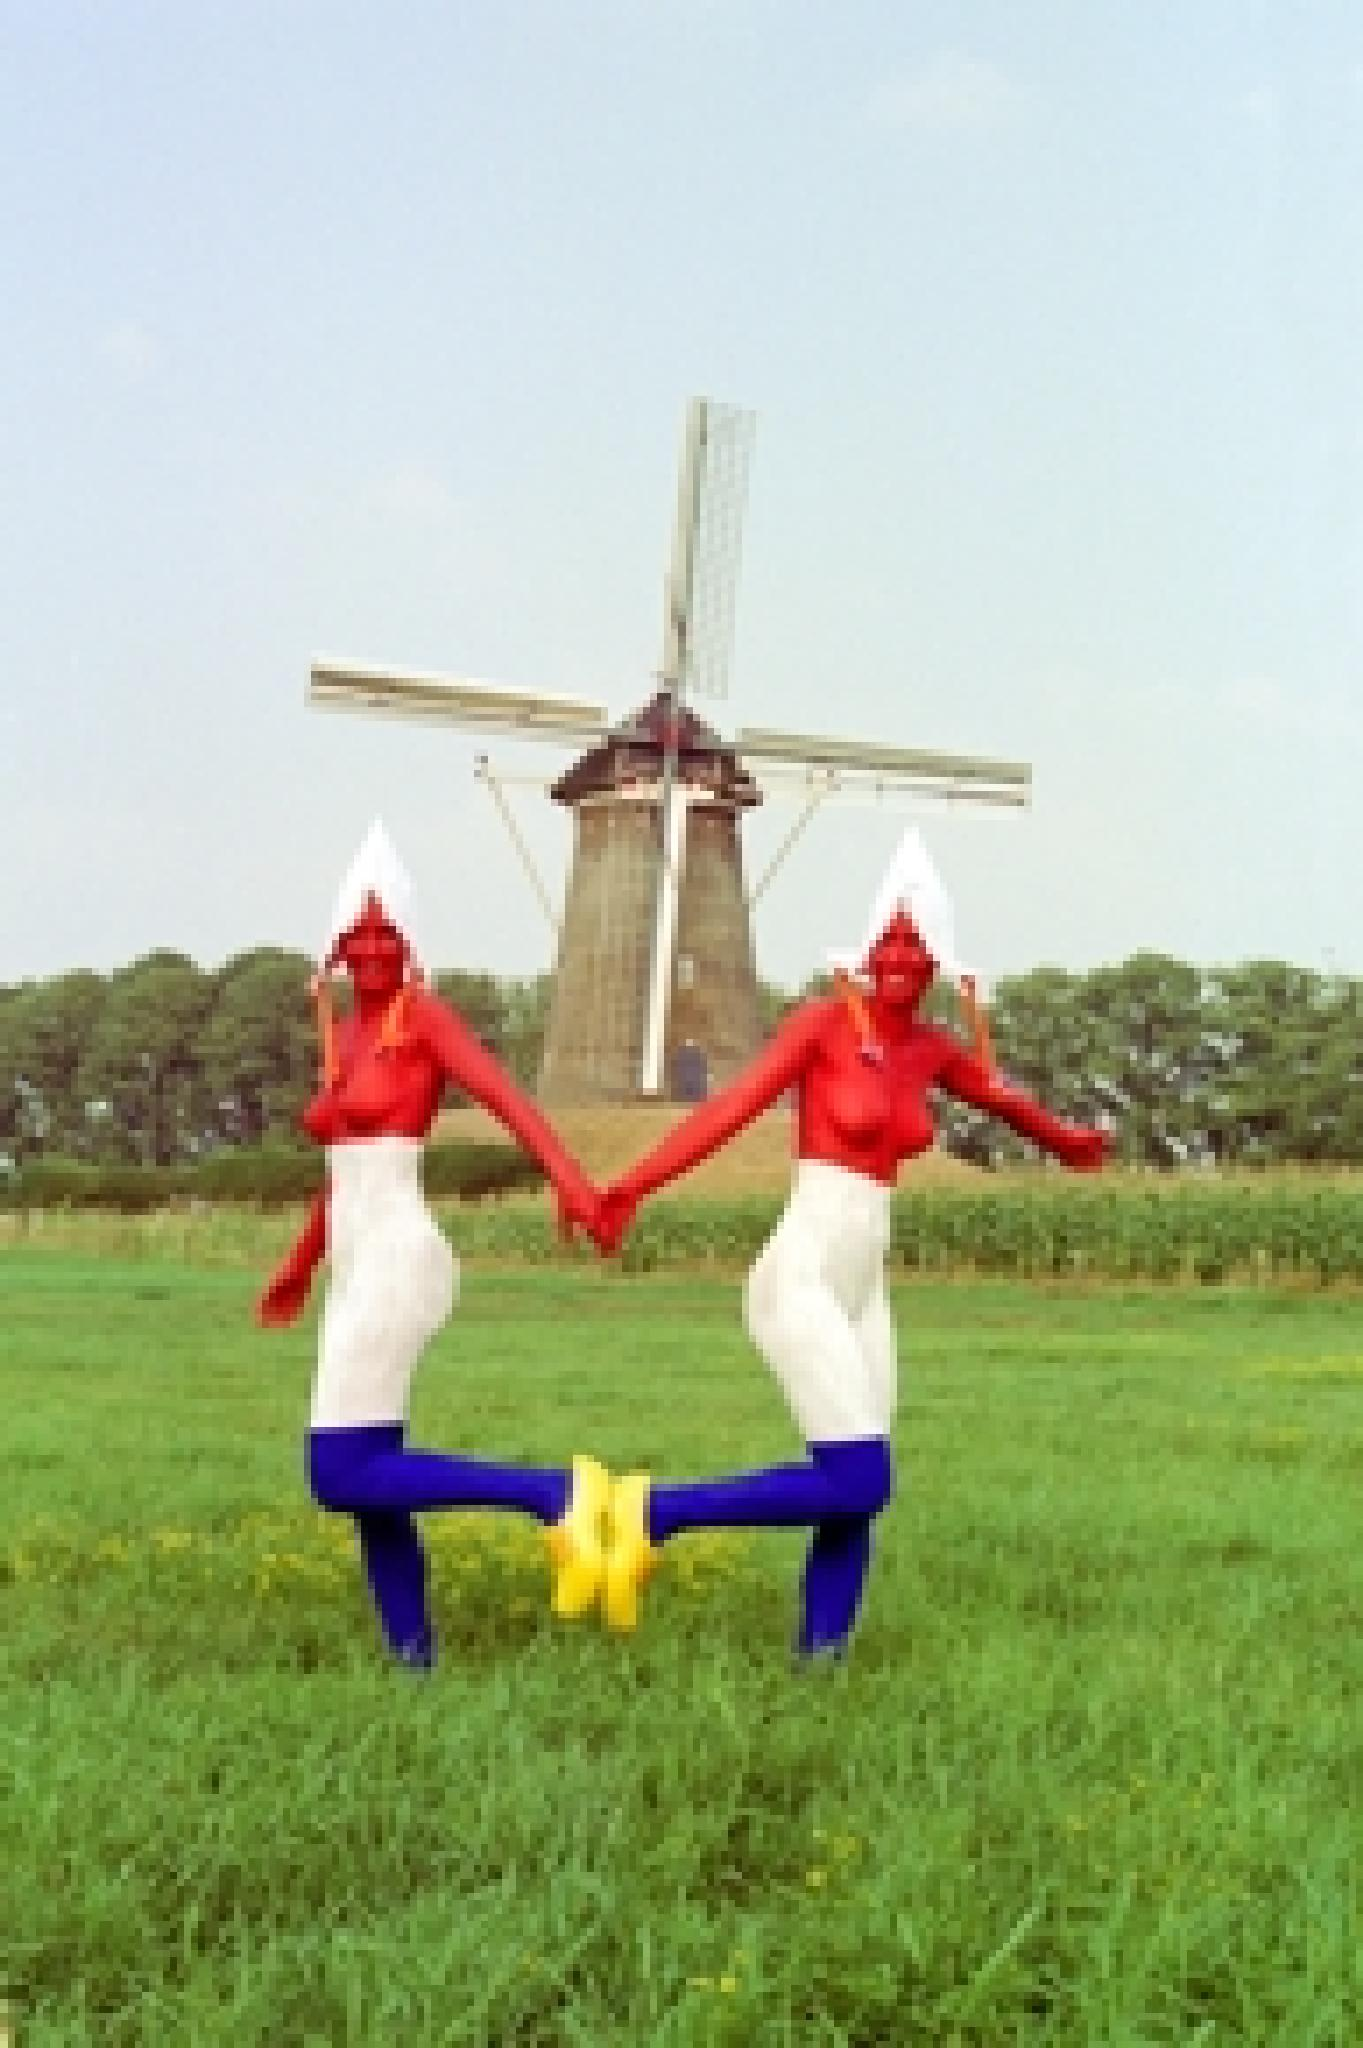 Double Dutch by Amit Bar